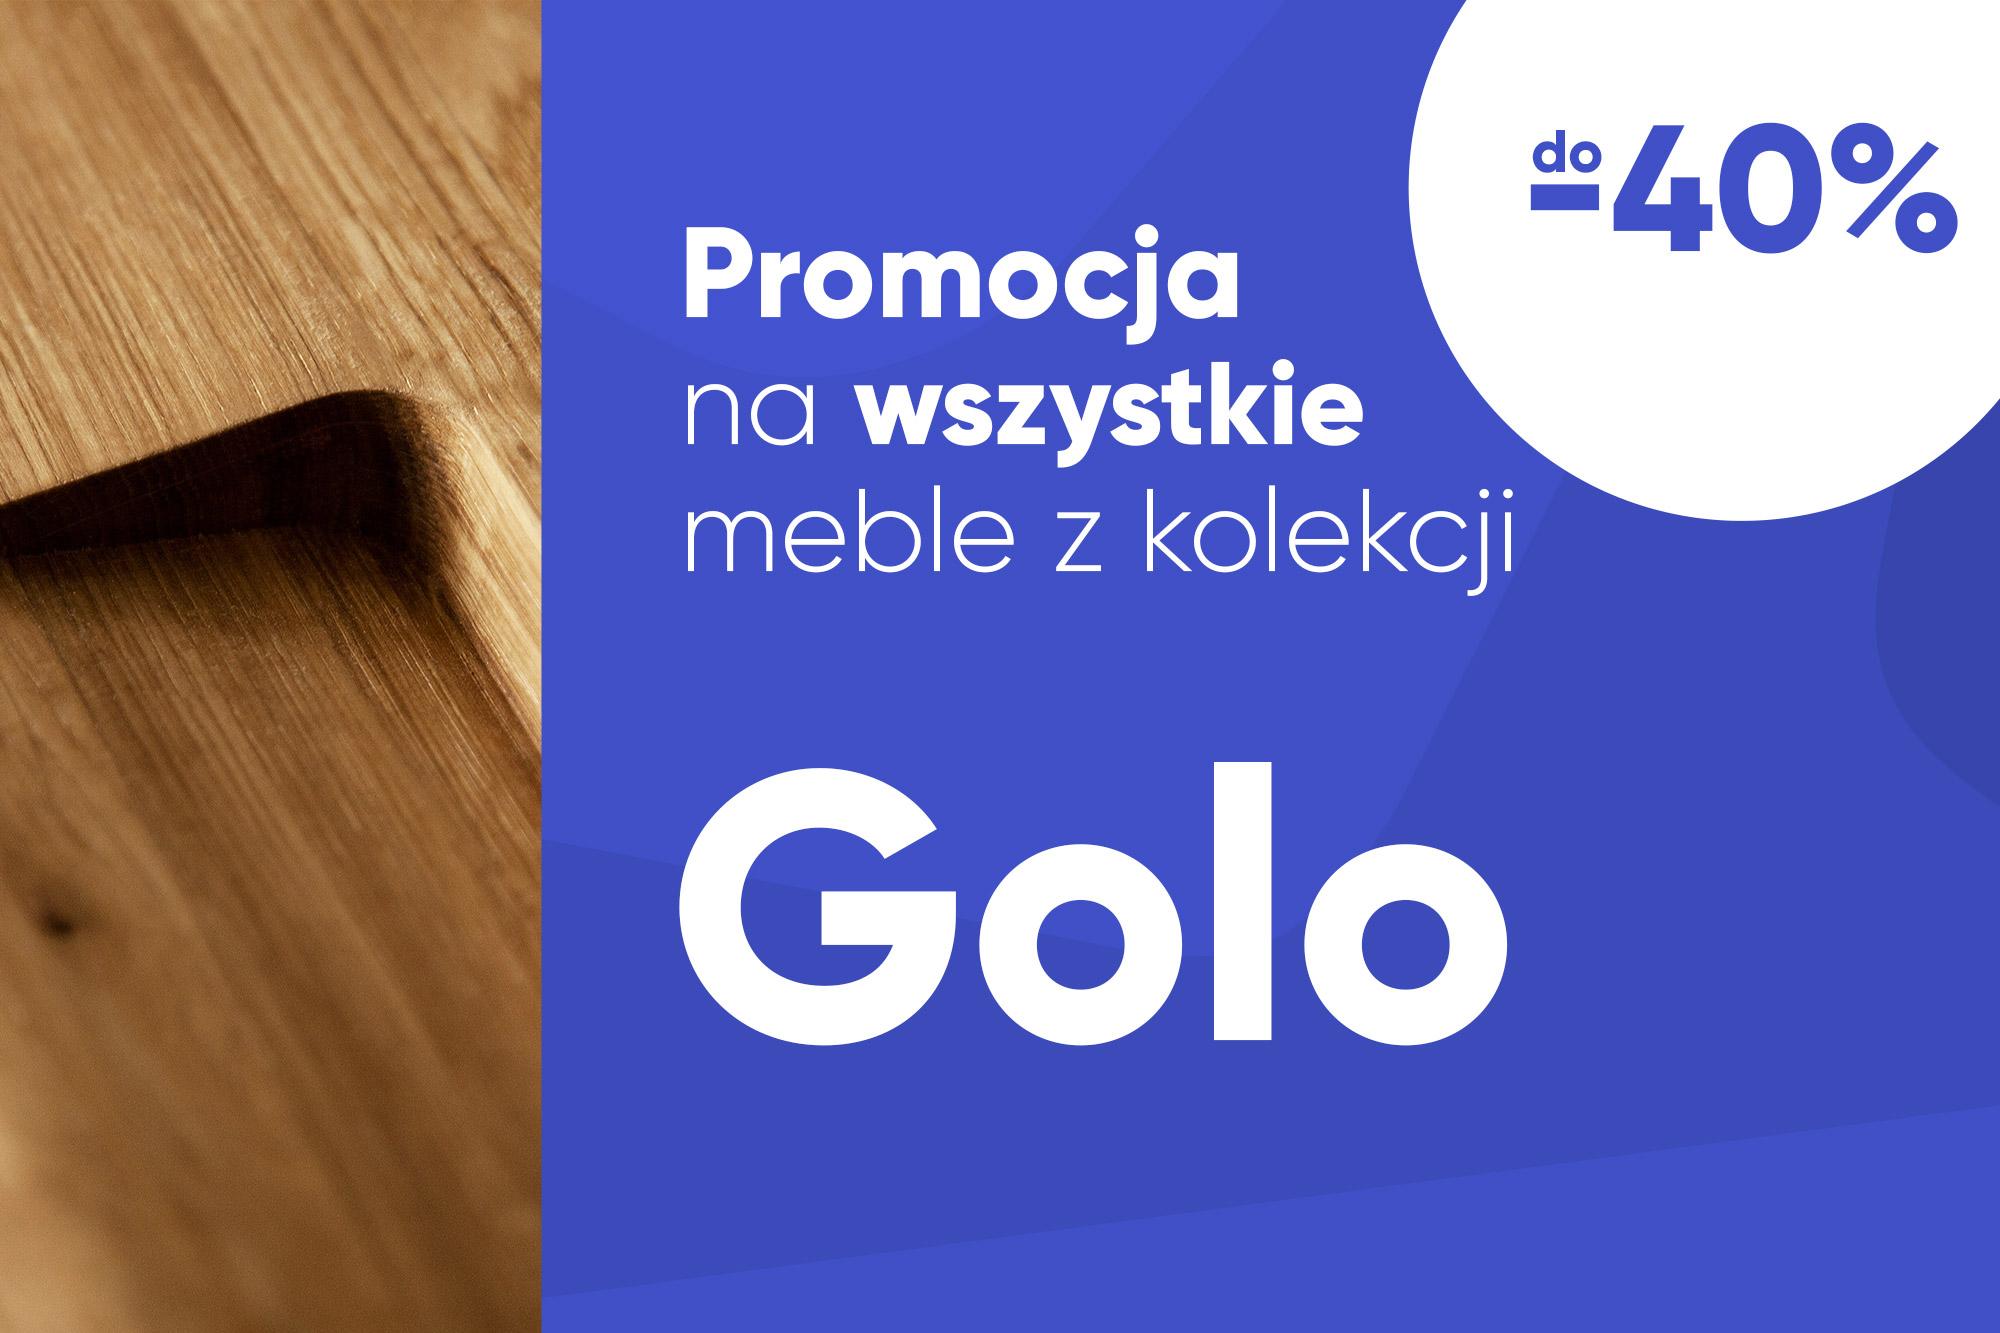 Image 1 - Golo